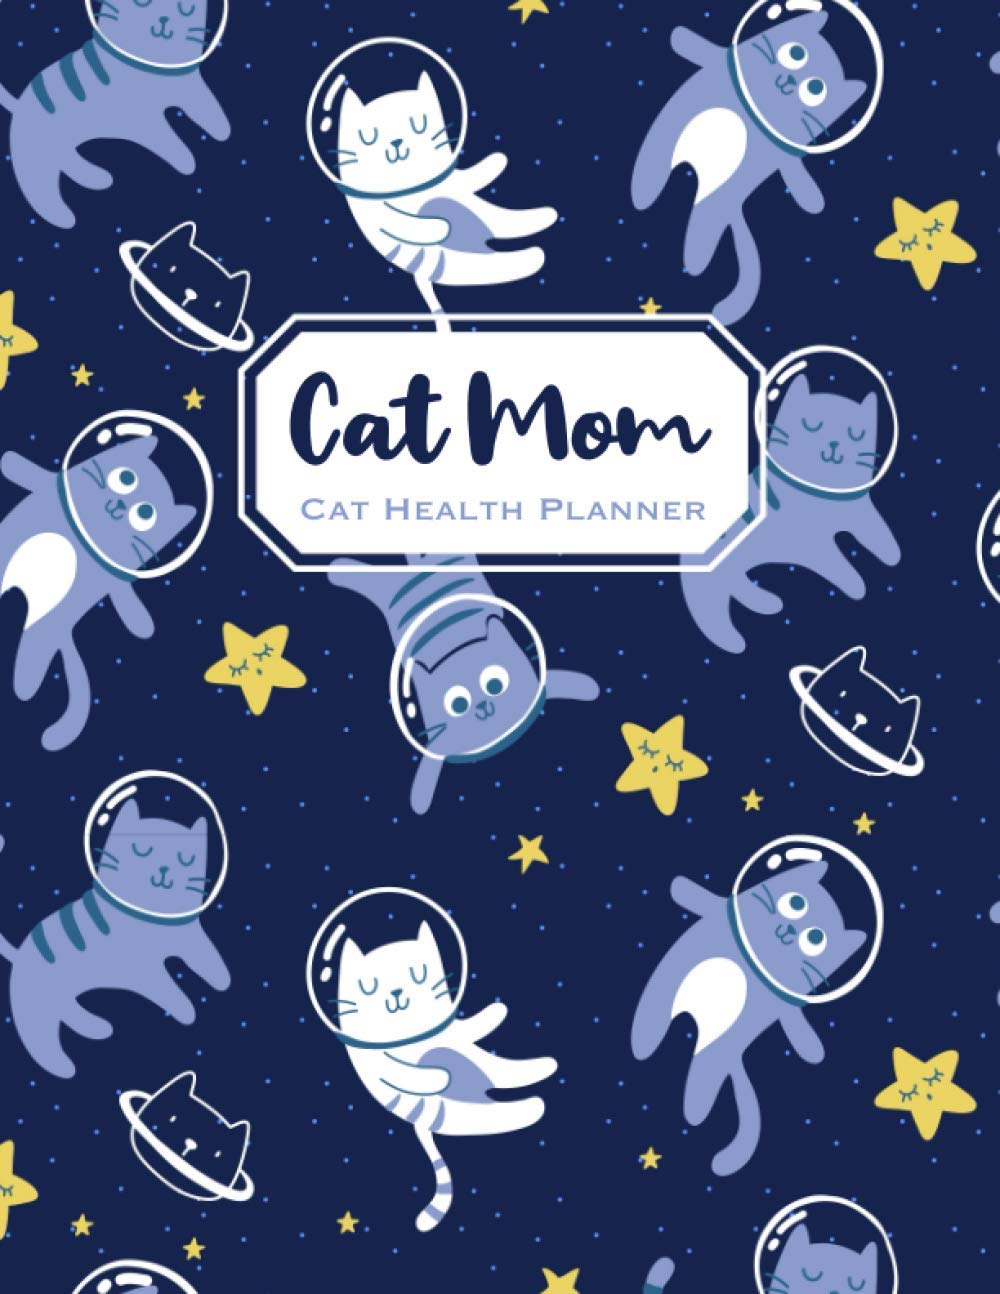 Cat Mom Cat Health Planner: Cat Health Log Book Pet Medical Record Book Cat Vaccination Journal